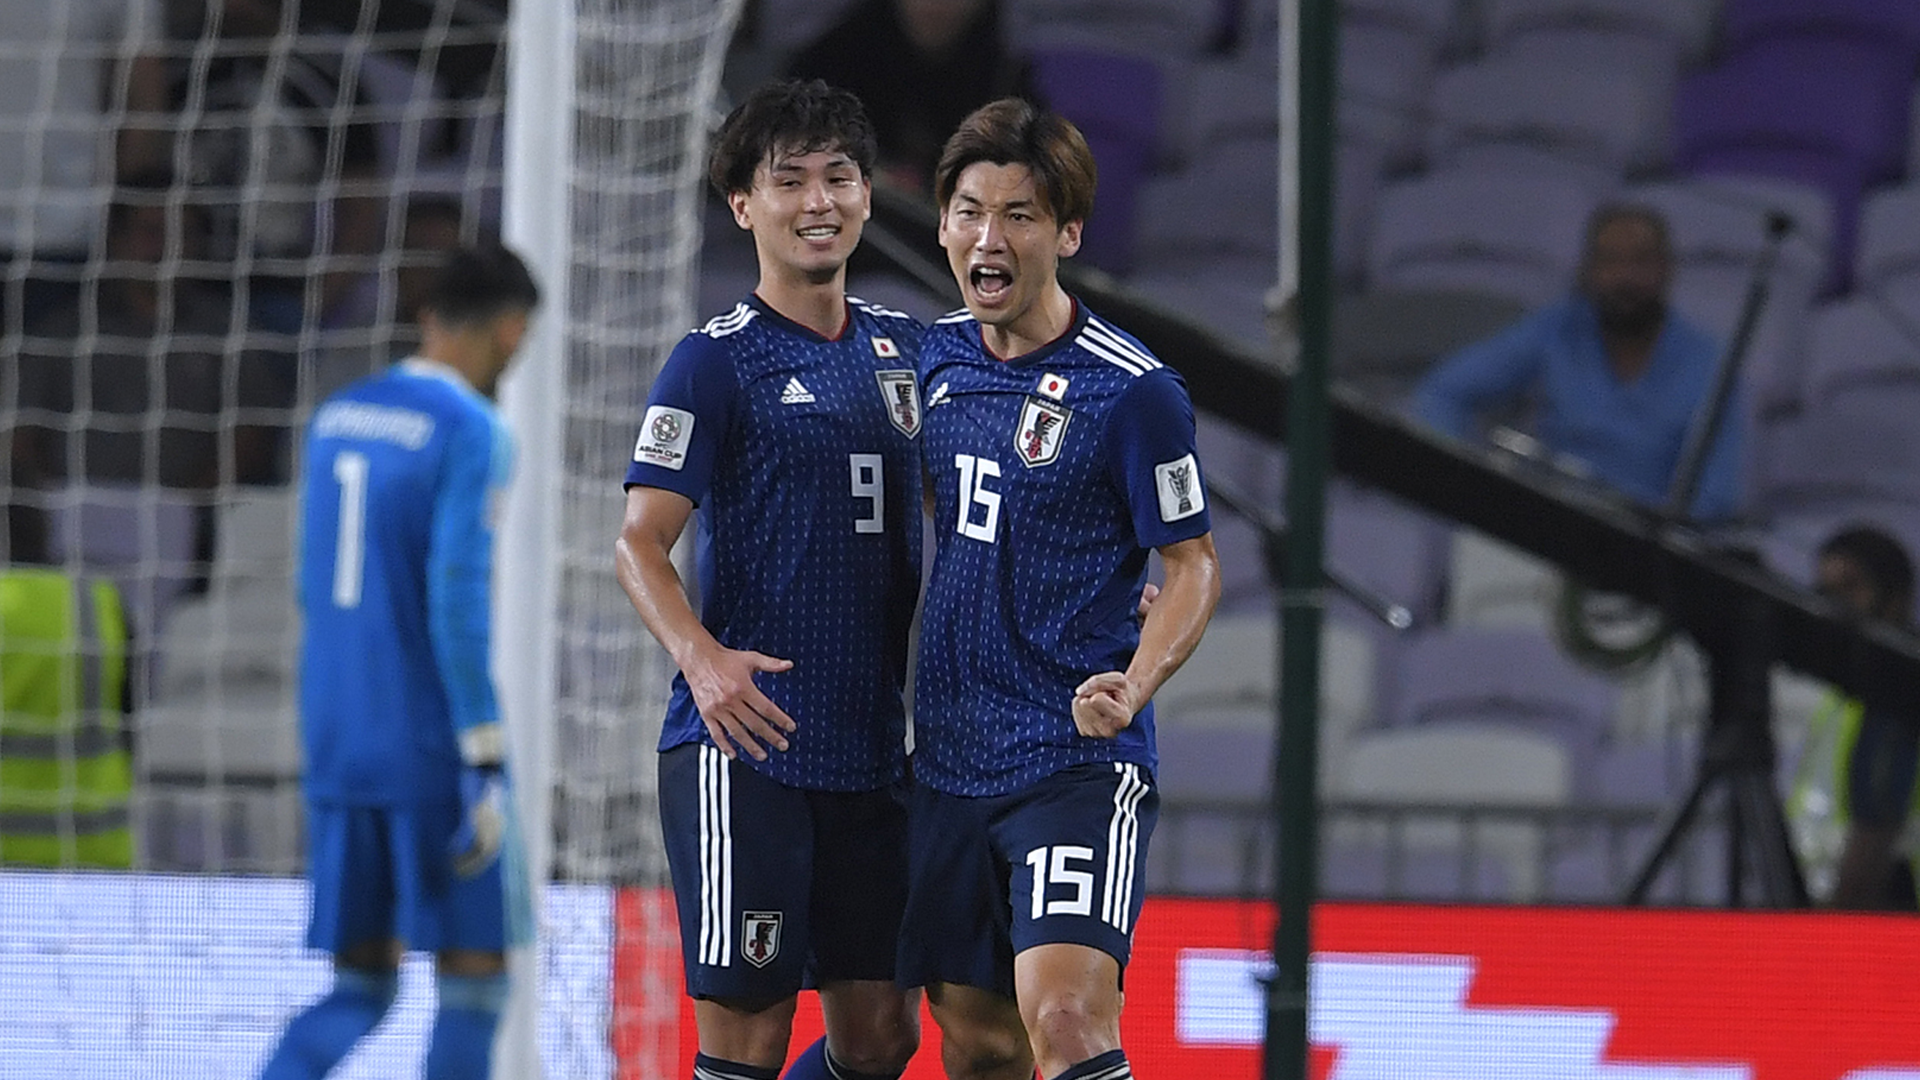 Japan vs uruguay betting tips super bowl betting games family arcade